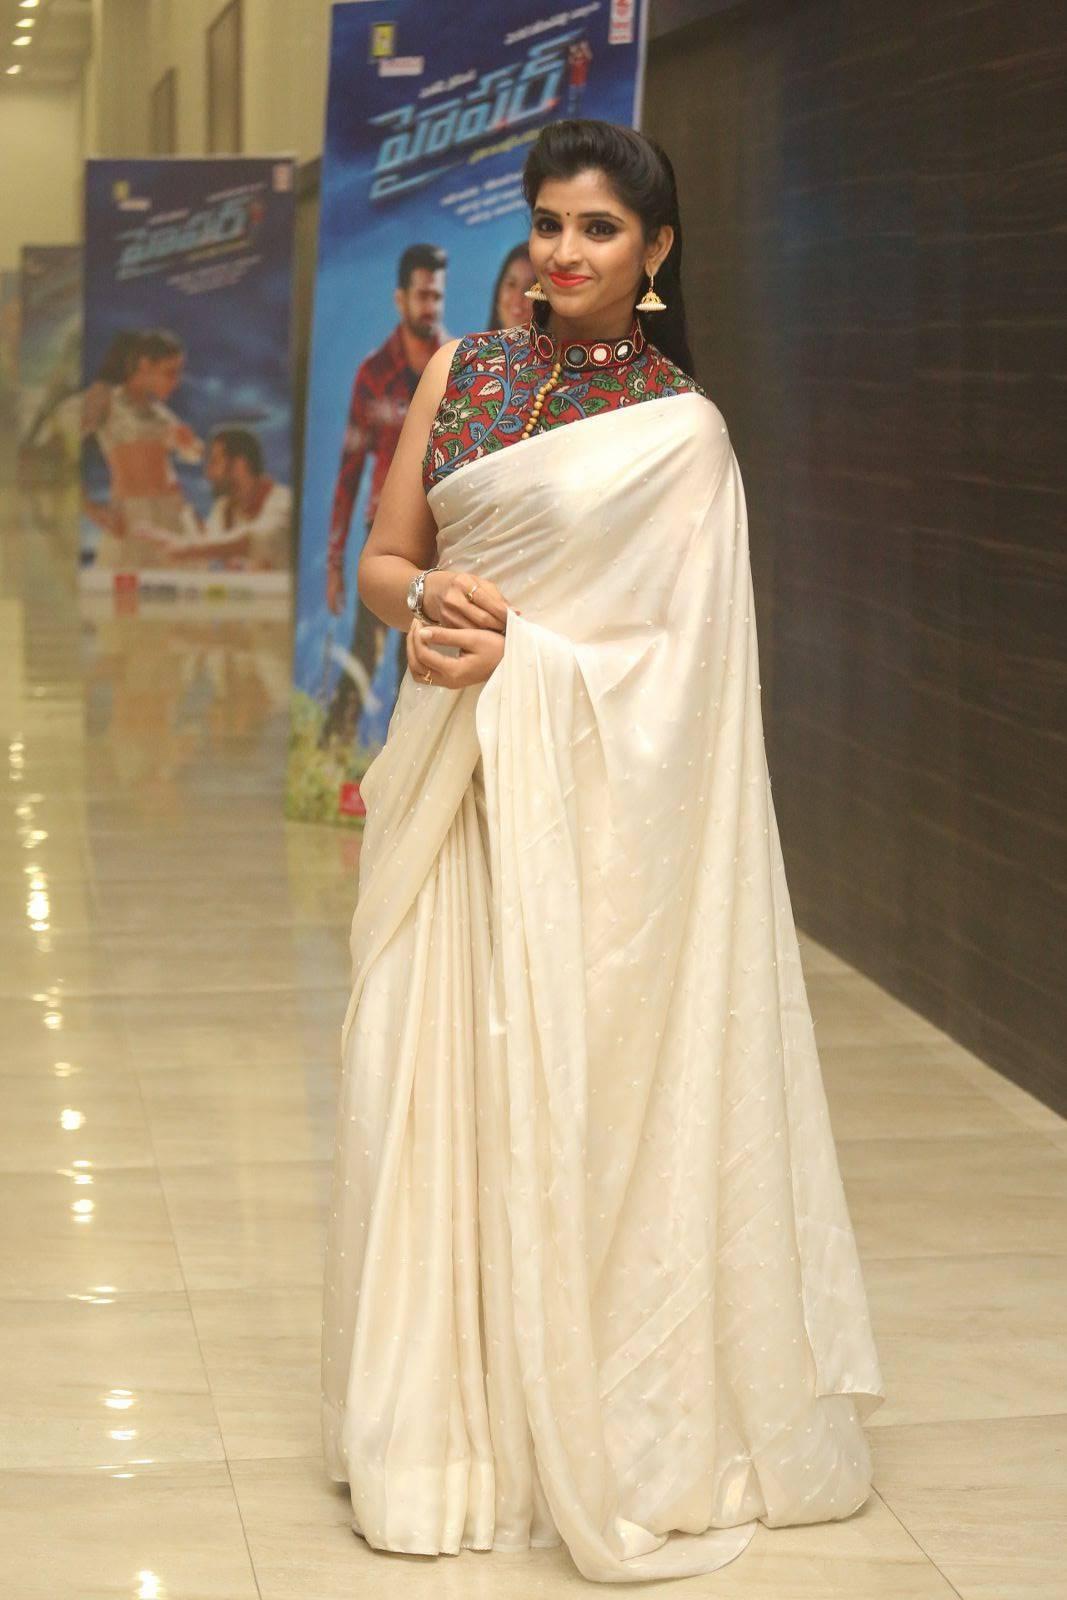 Tv Anchor Syamala Stills At Hyper Theatrical Trailer Launch In Hot White Saree